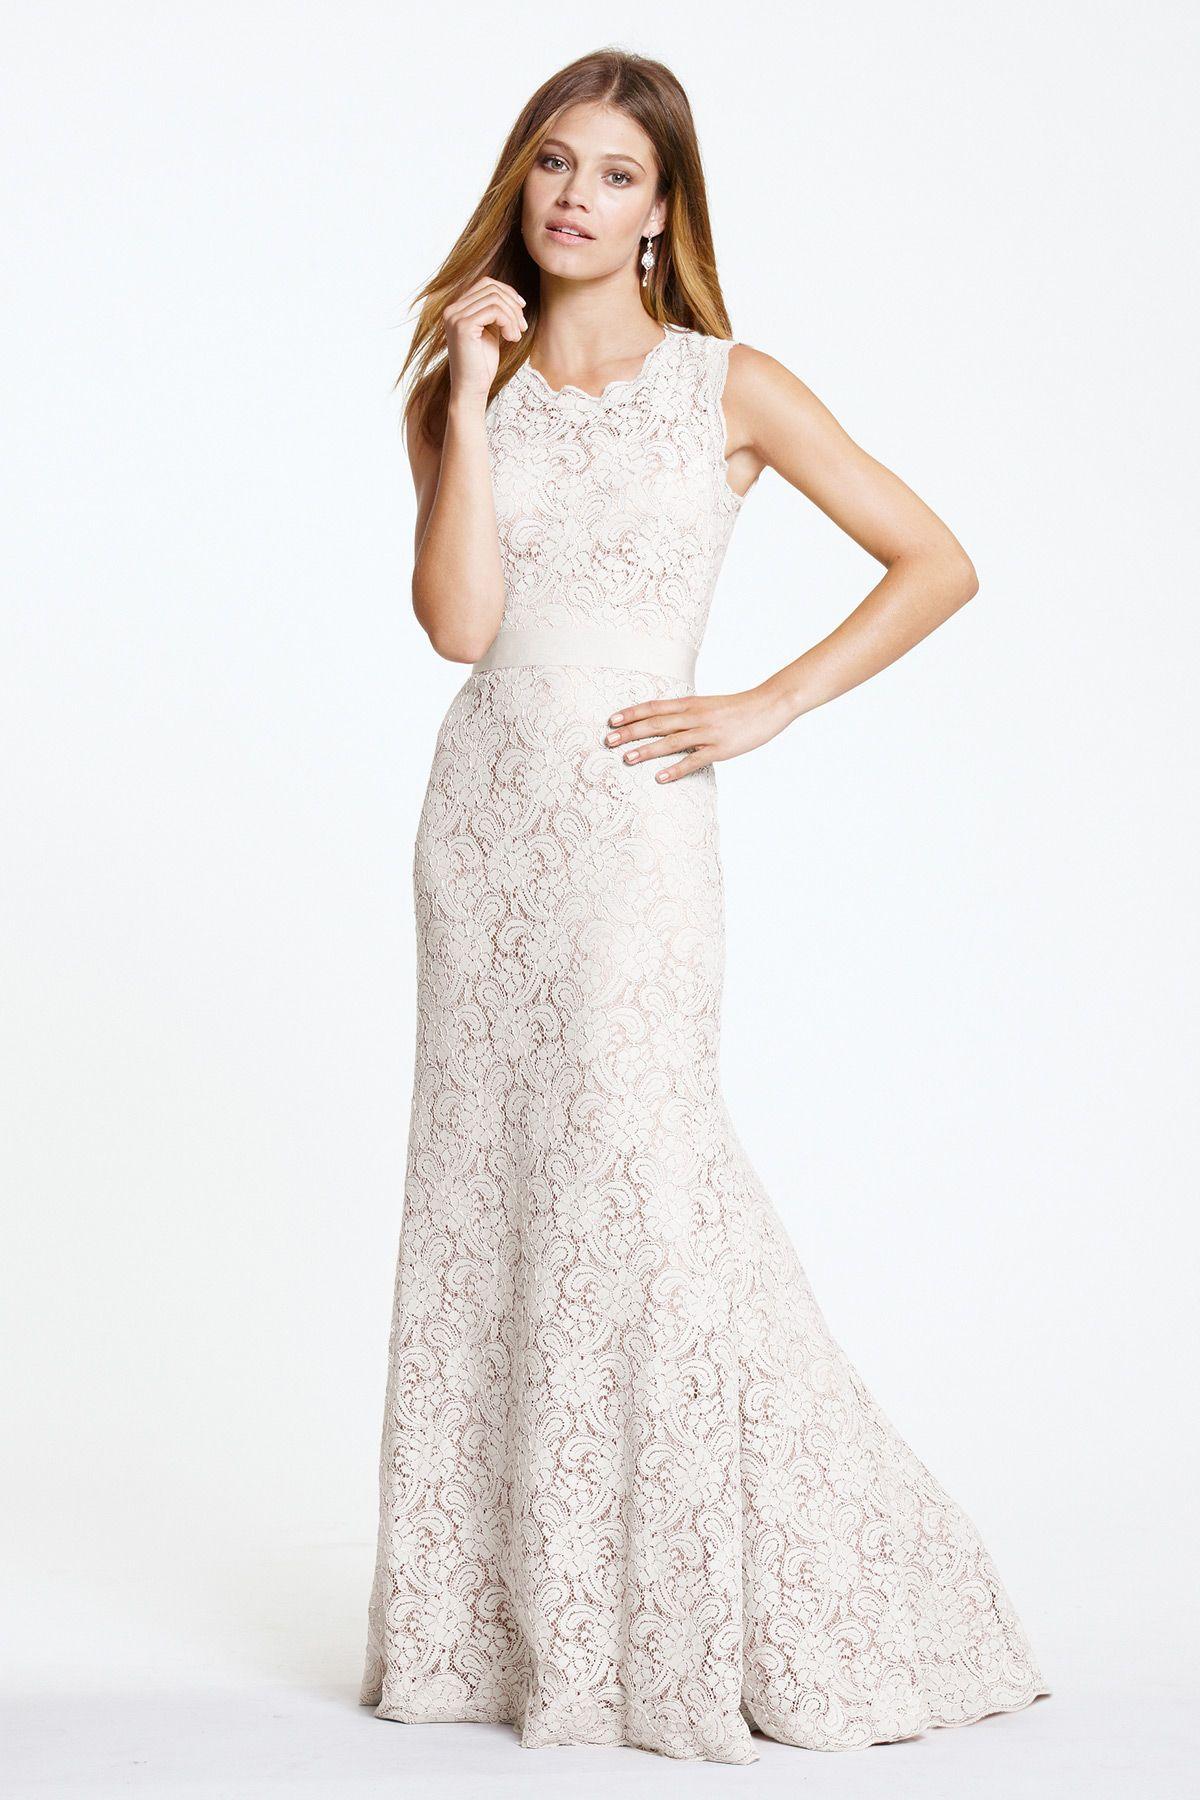 Dress andrea style e wedding dresses pinterest wedding